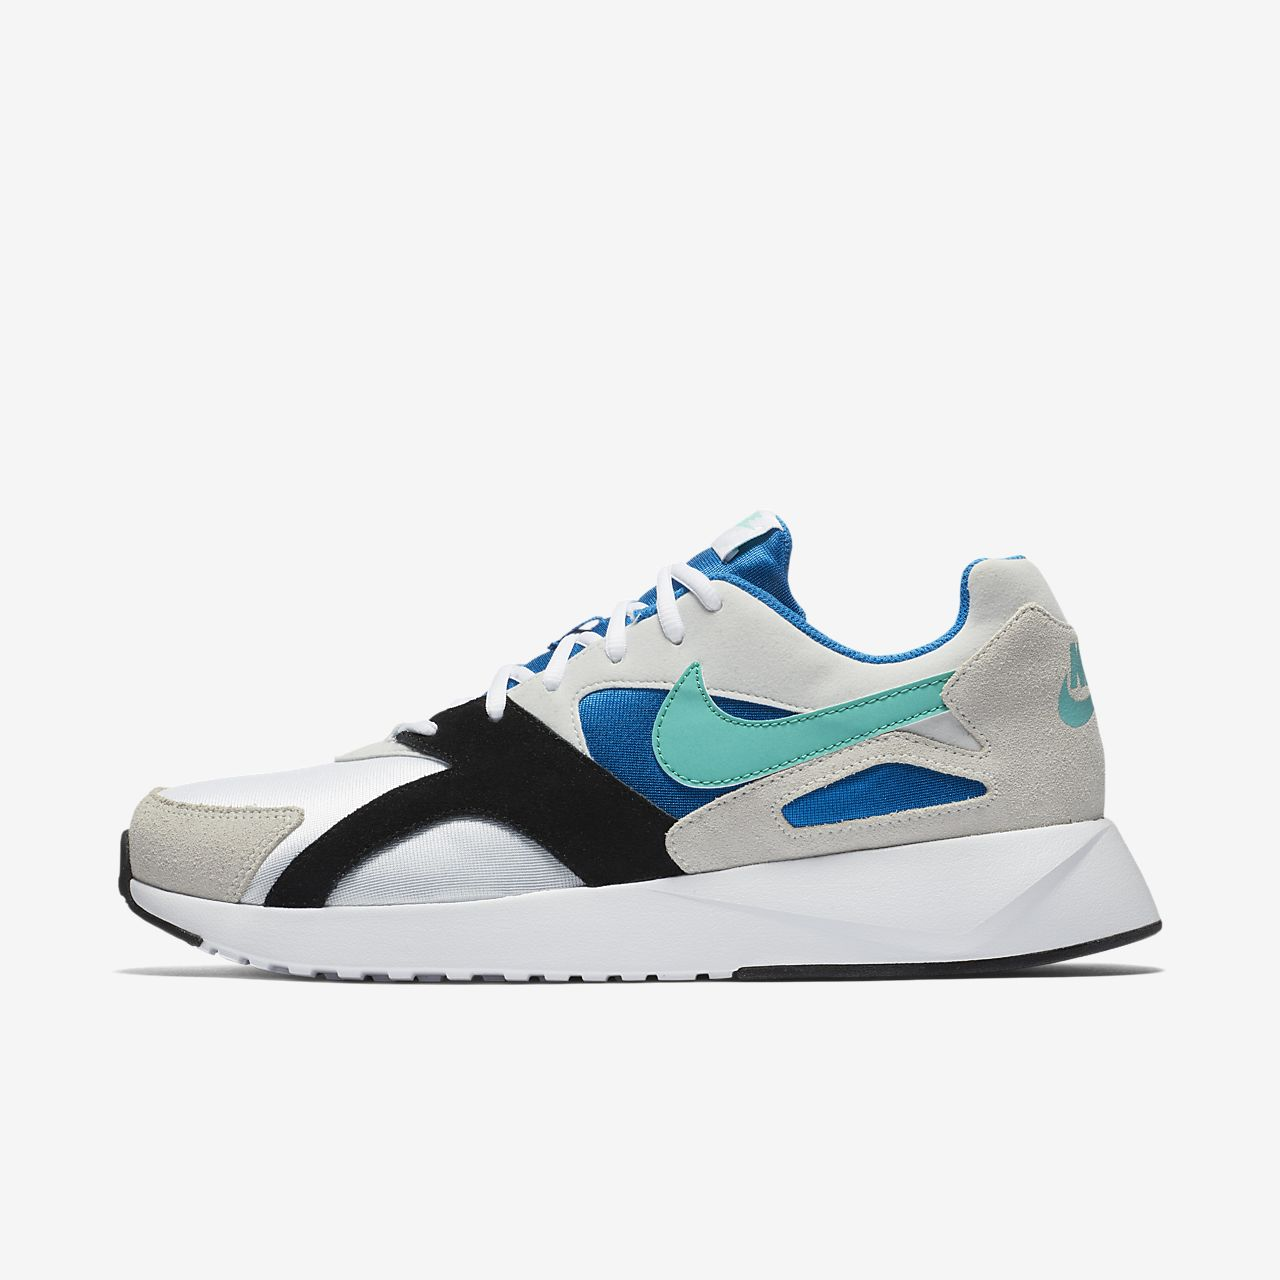 Zapatillas de deporte blancas Pantheos 916776-101 de Nike Nike 7t3sky7hm5